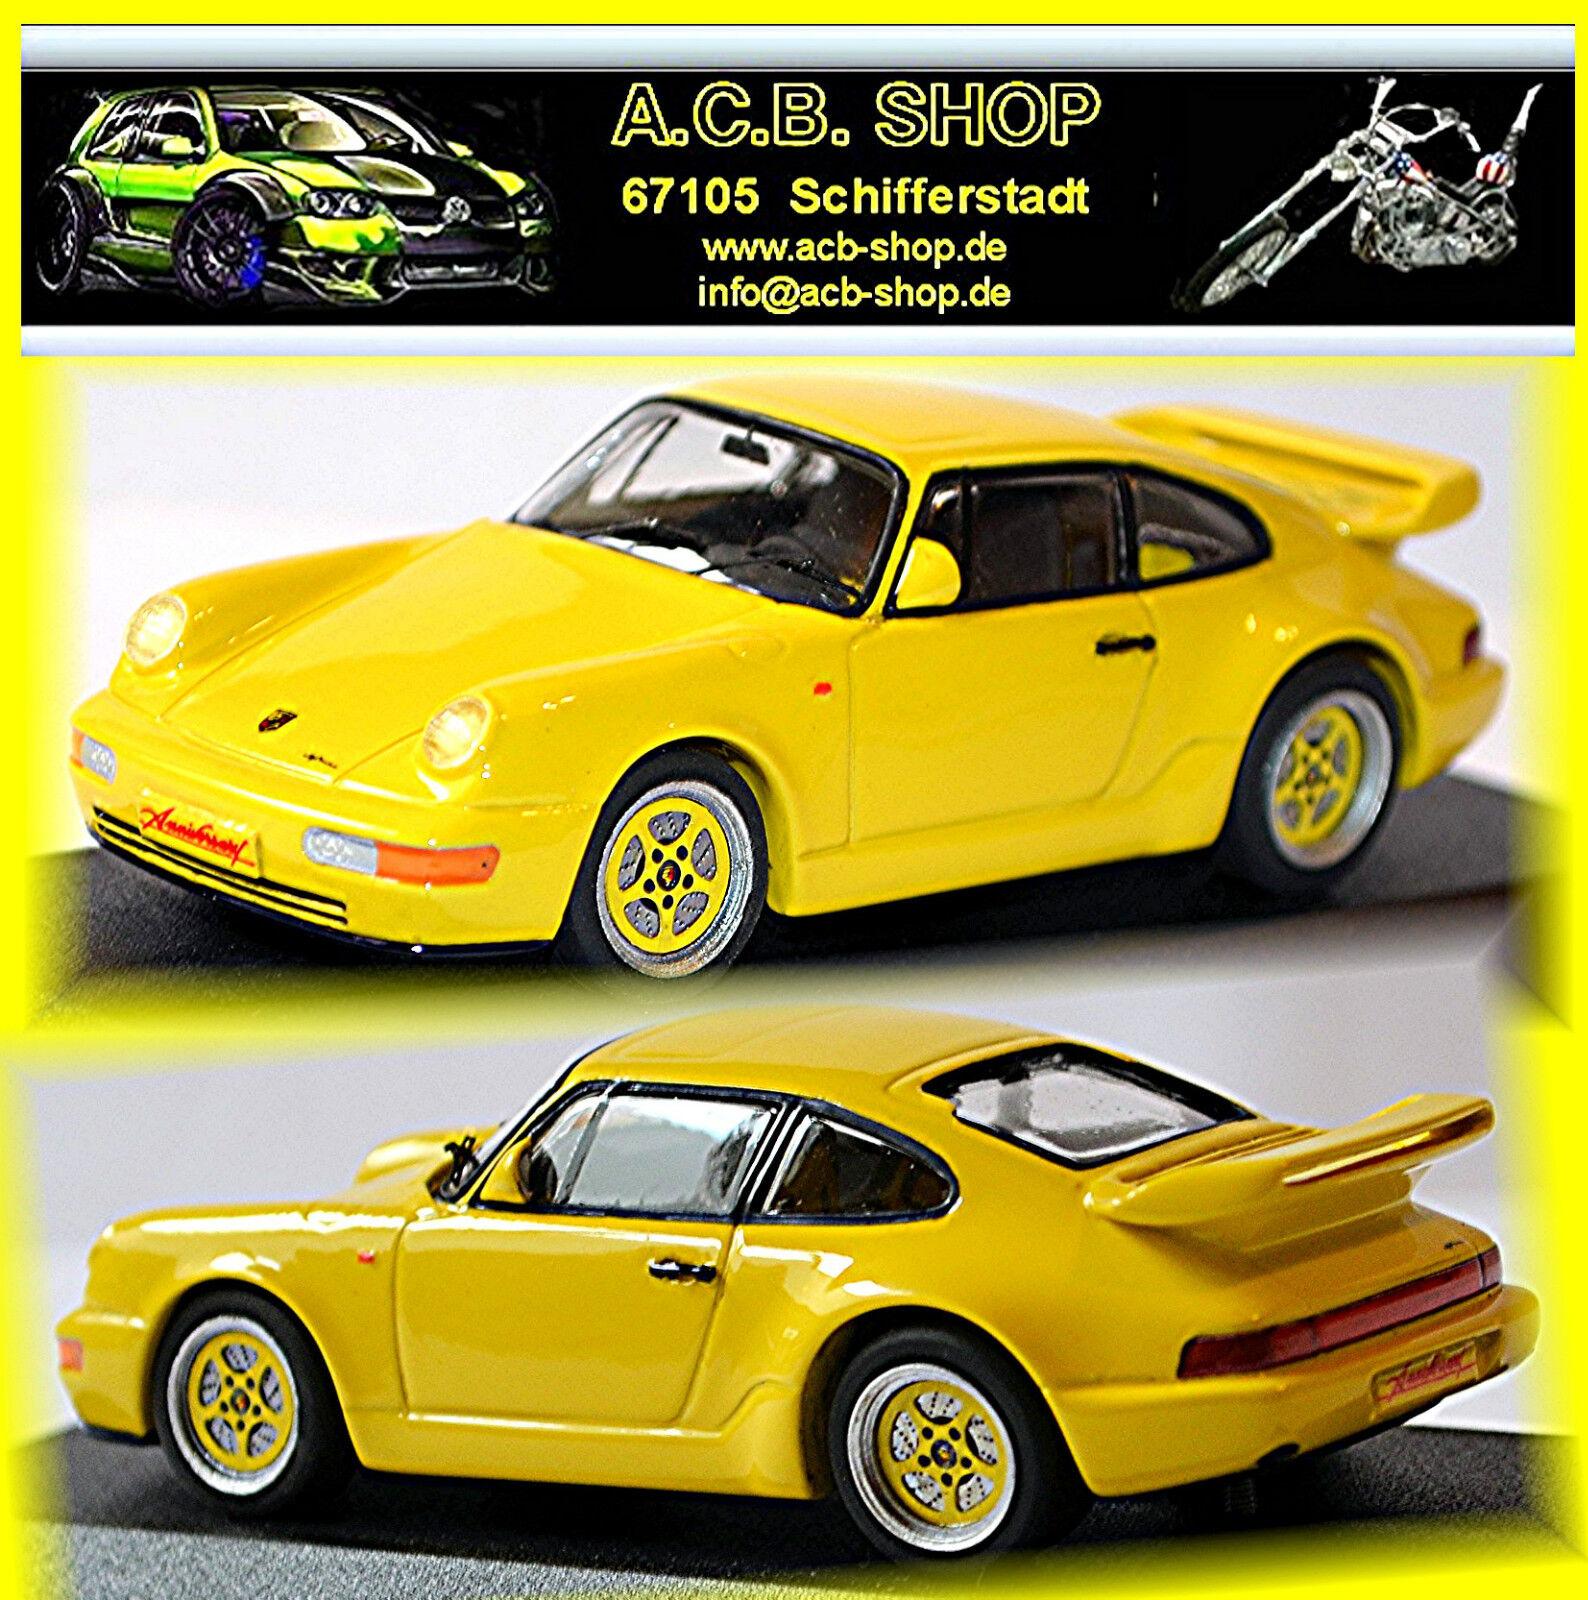 Porsche 911 Carrera 3,2 L Anniversary Typ 964 1989 speedyellow yellow 1 43 Starter